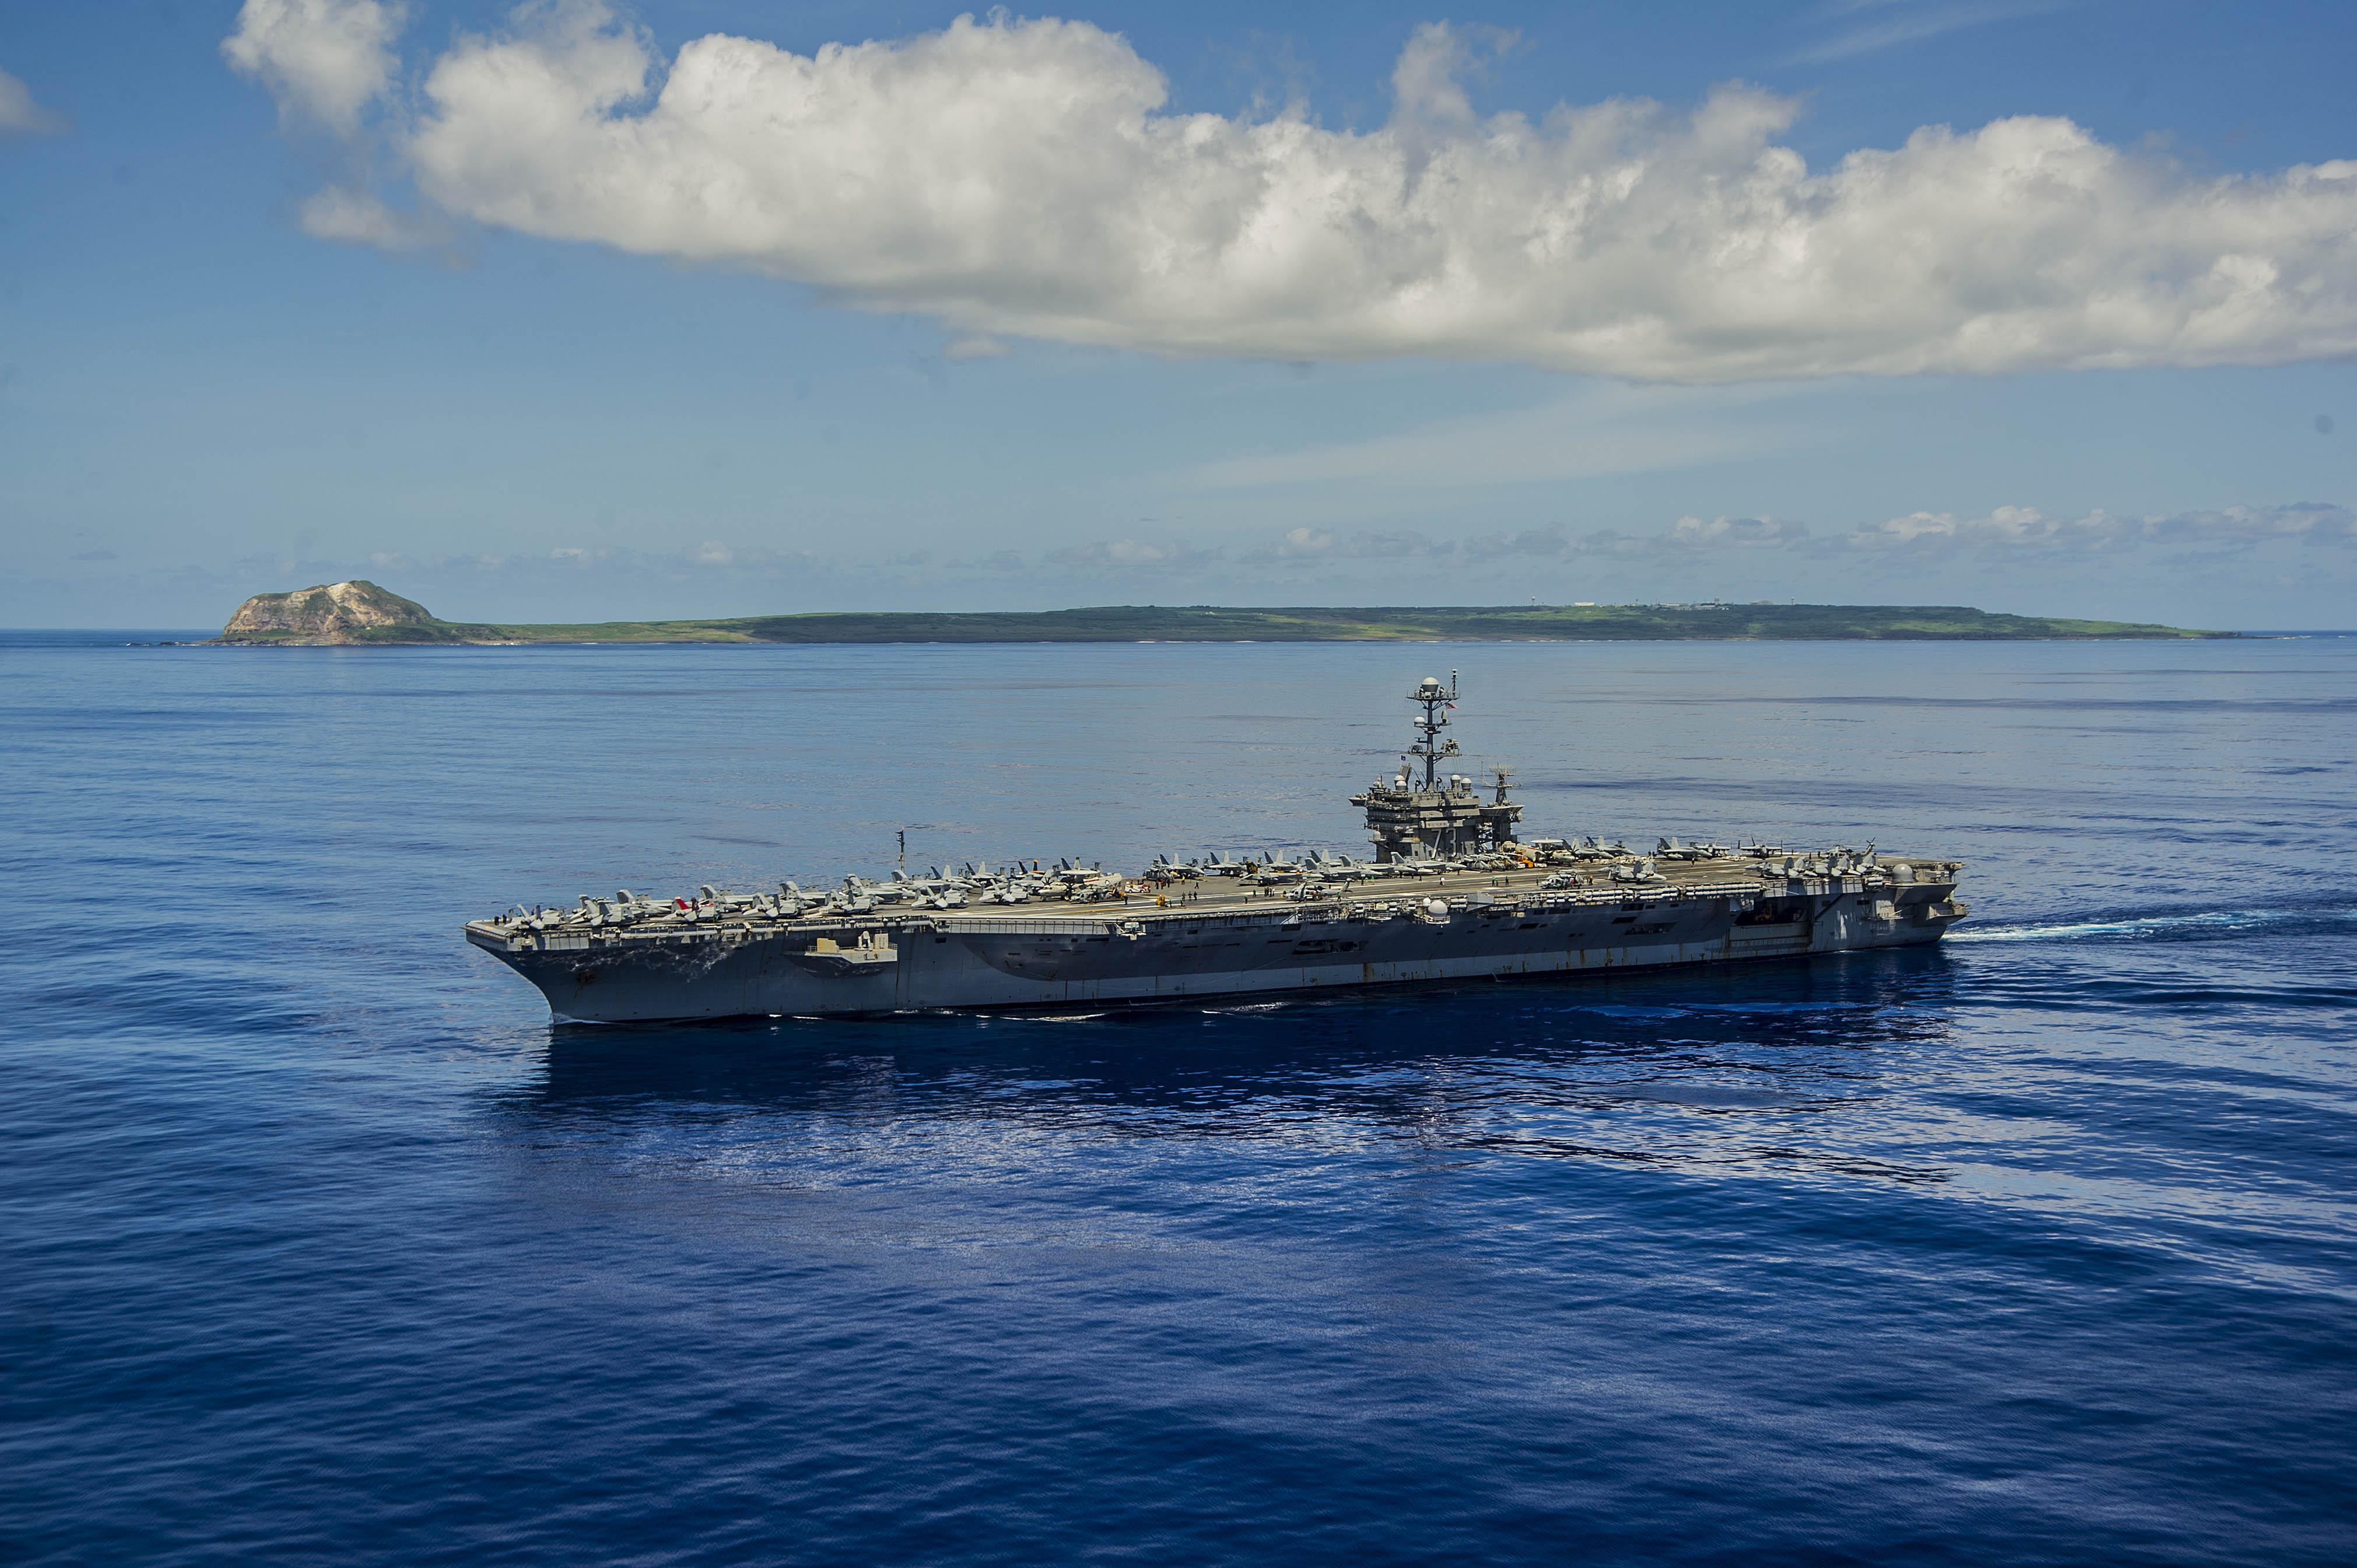 USS GEORGE WASHINGTON CVN-73 am 07.09.2014 vor Iwo To (früher: Iwo Jima) Bild: U.S. Navy